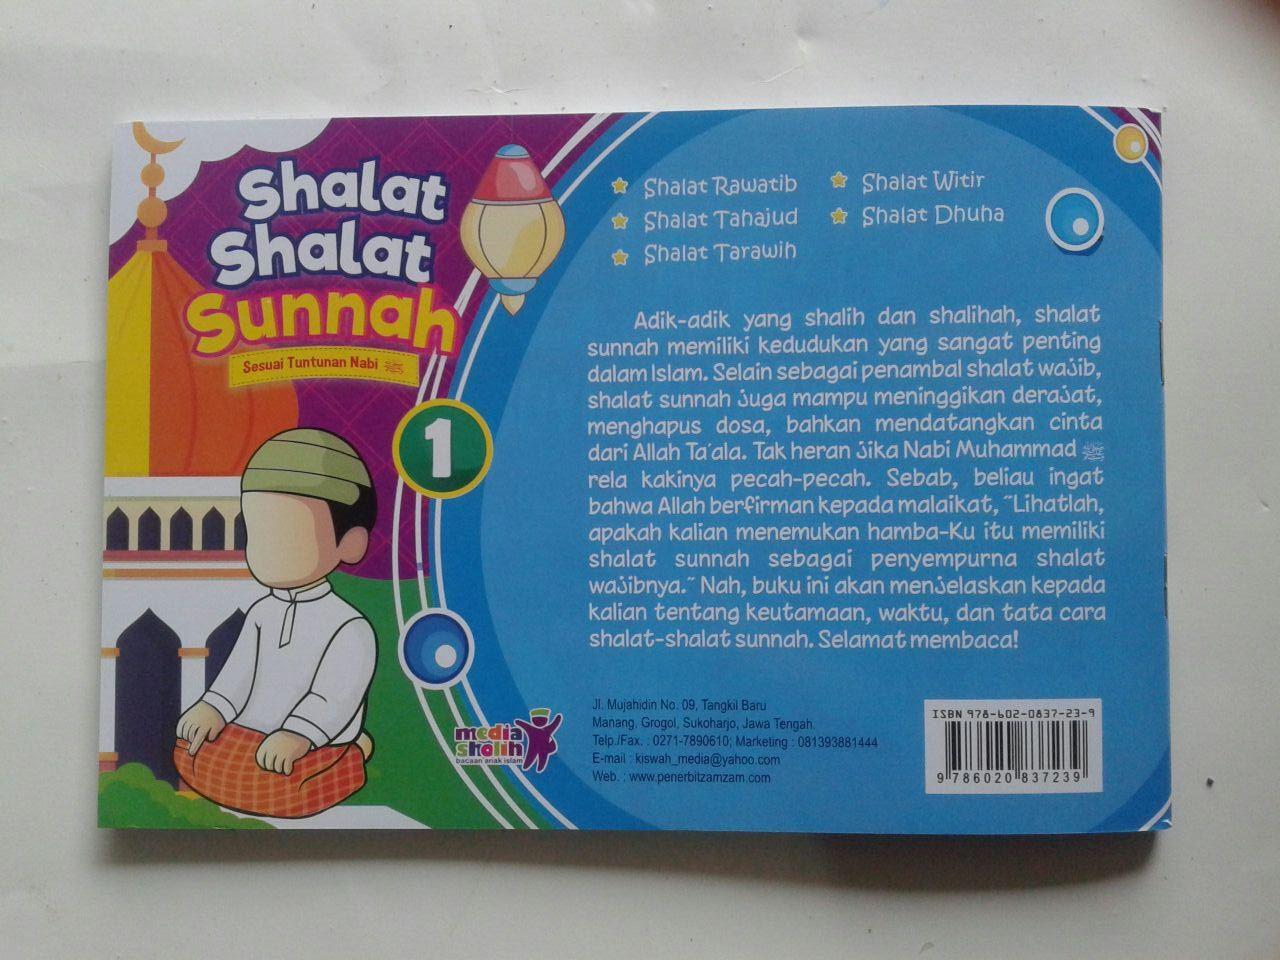 Buku Anak Shalat Shalat Sunnah Sesuai Tuntunan Nabi 1 cover